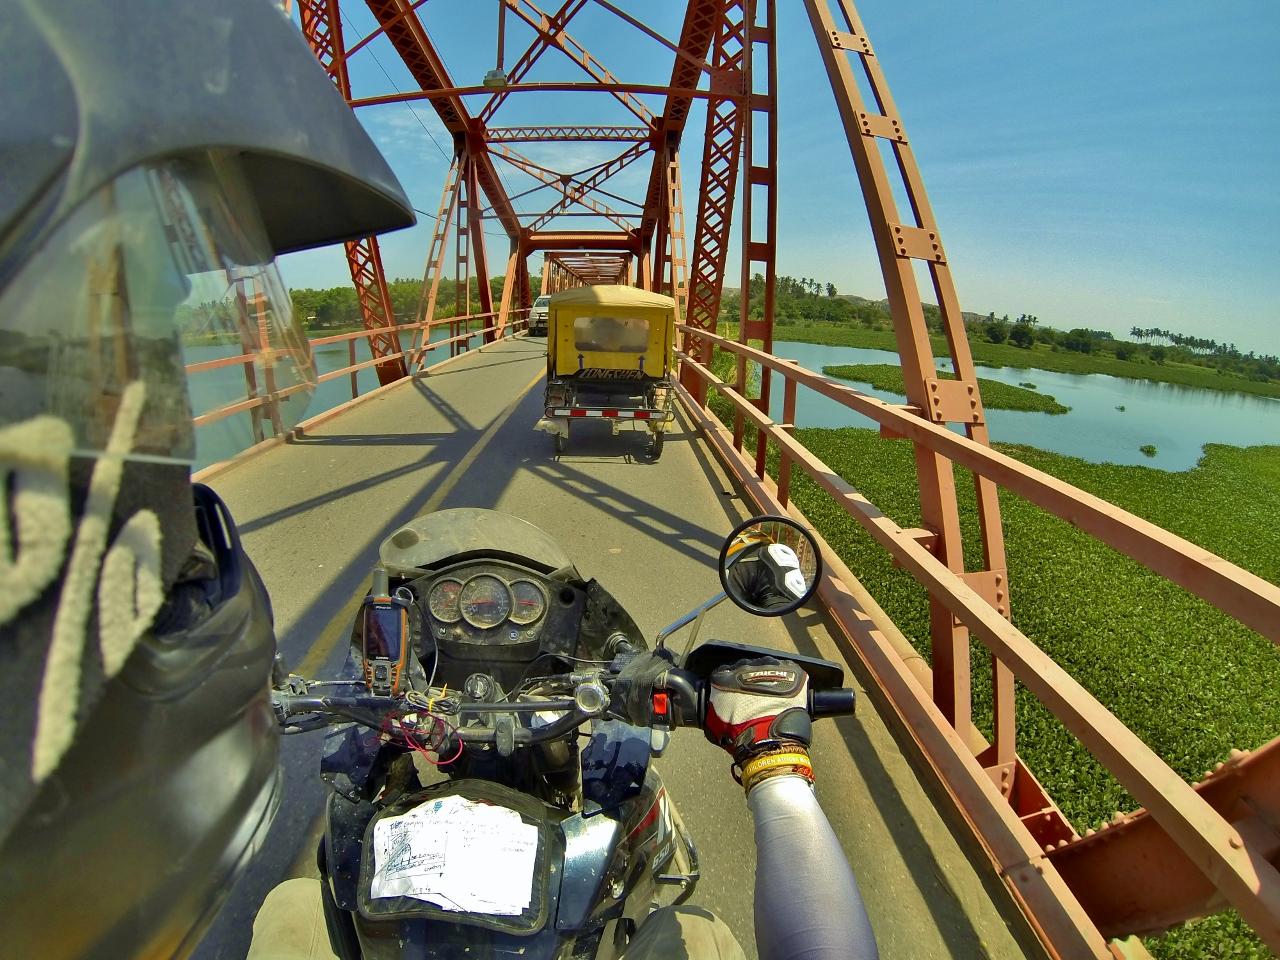 Crossing the Río Chira in Sullana